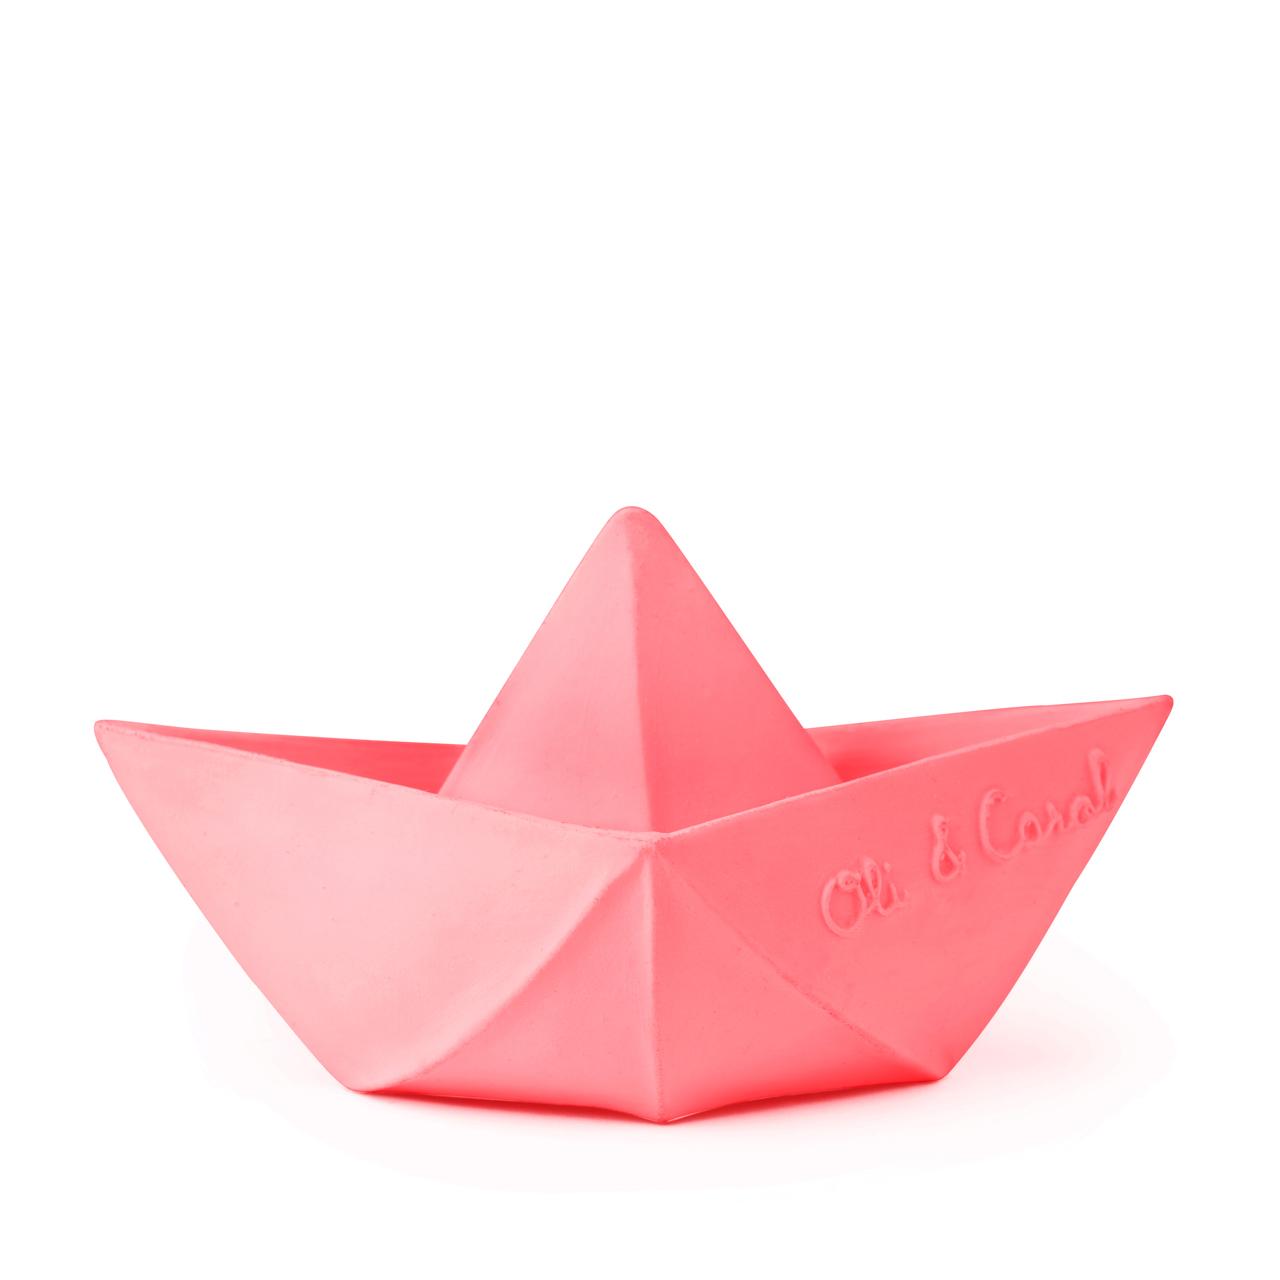 origamiboot-oliundcarol-zuckerfrei-berlin-hoiberlin.jpg